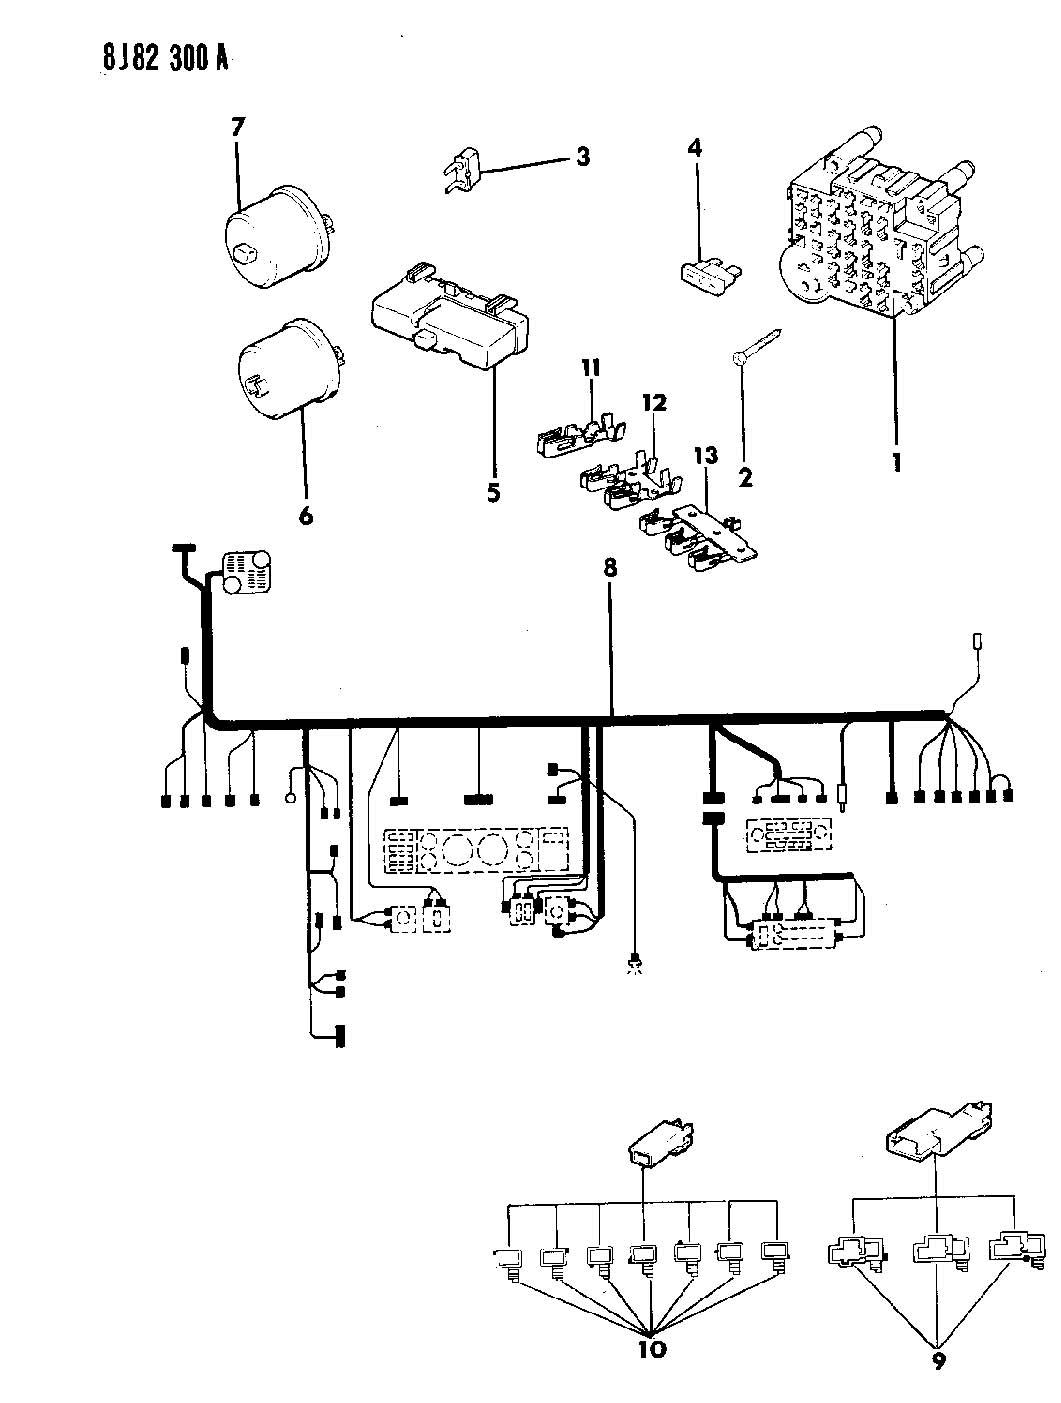 hight resolution of jeep wrangler tail light wiring diagram jeep yj tail light wiring diagram jodebal com on 1989